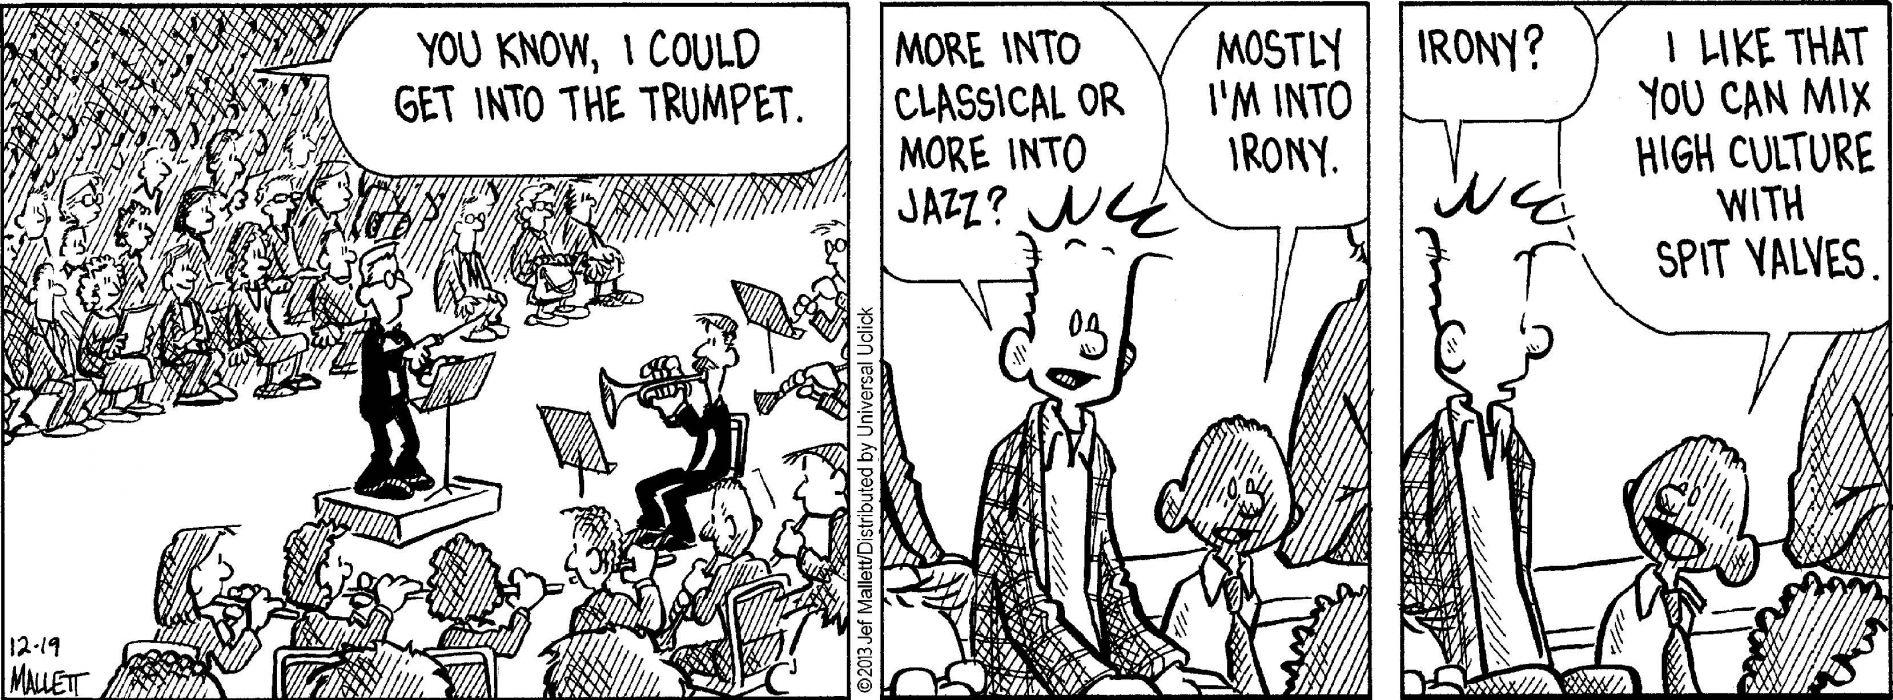 FRAZZ comicstrip humor funny comic (52) wallpaper